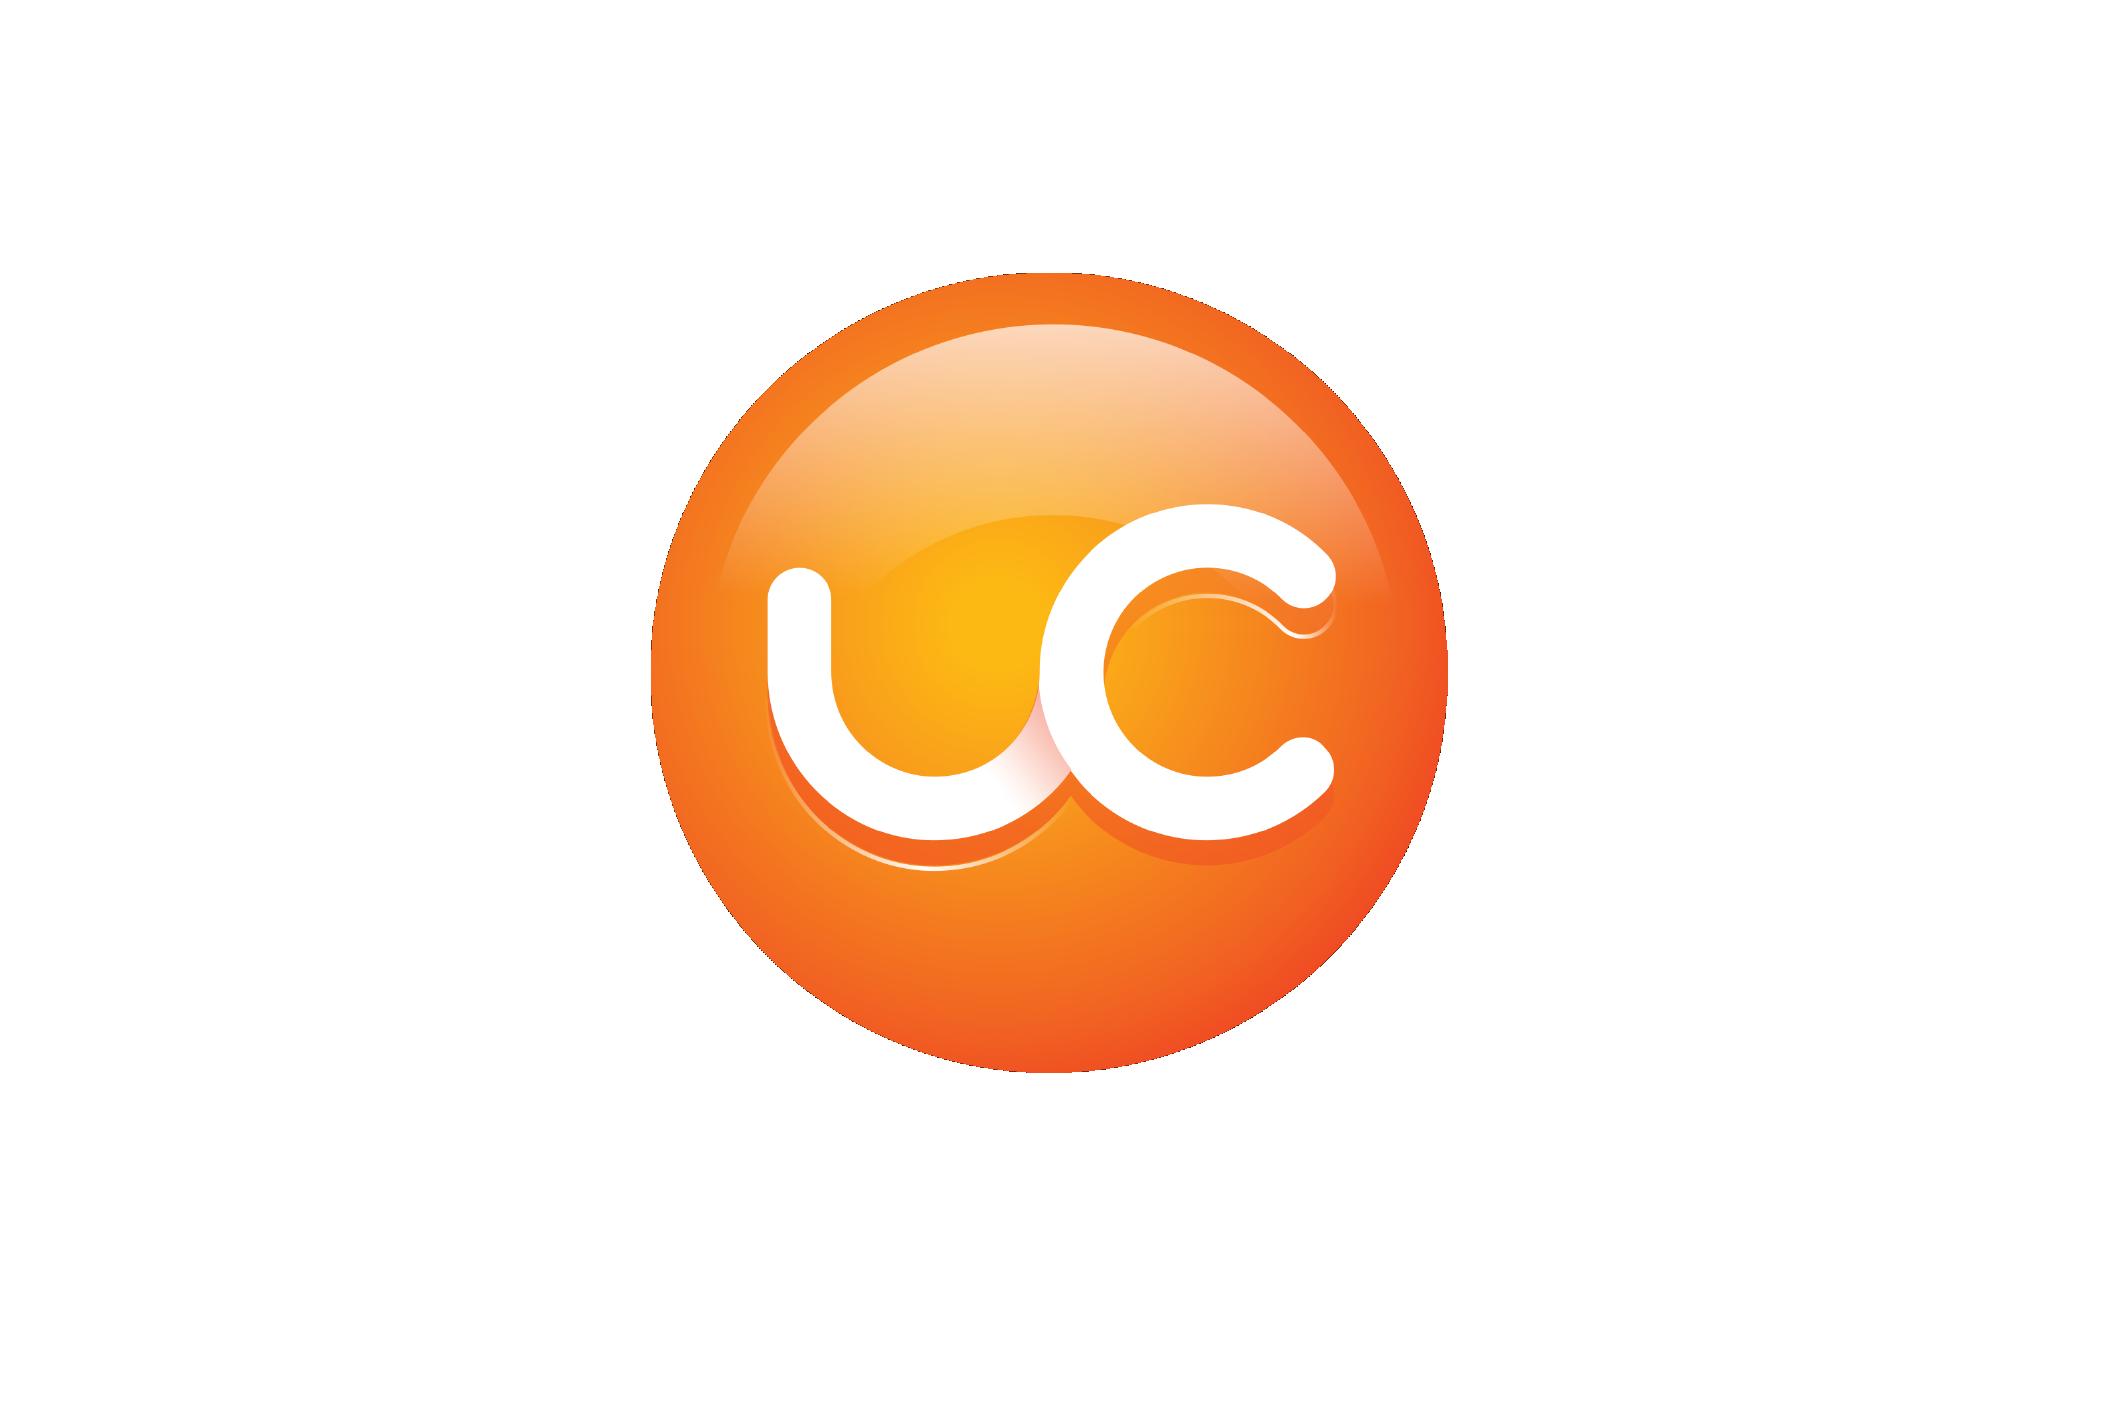 Unchain logo